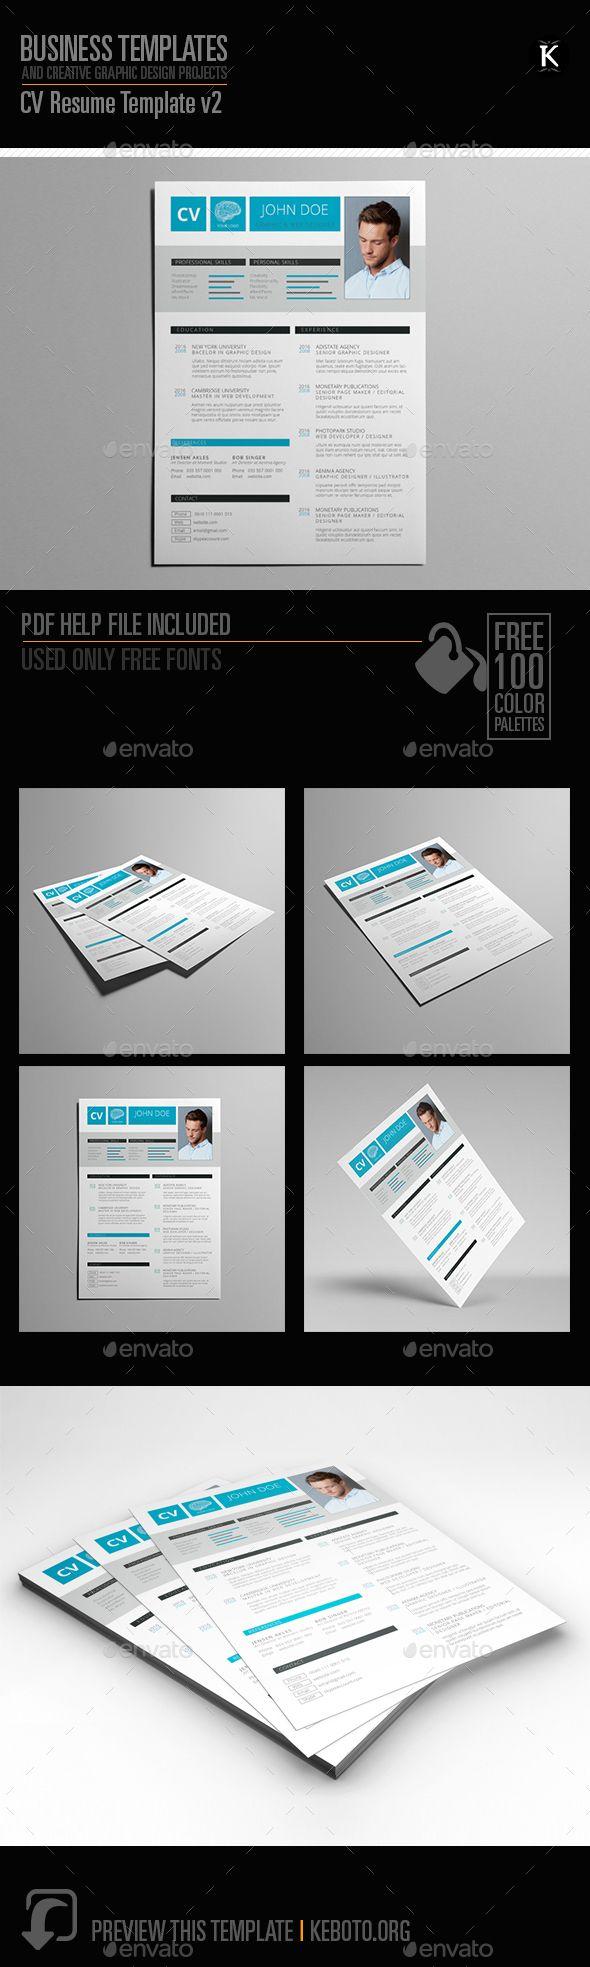 525 best Resume images on Pinterest | Creative resume design, Resume ...